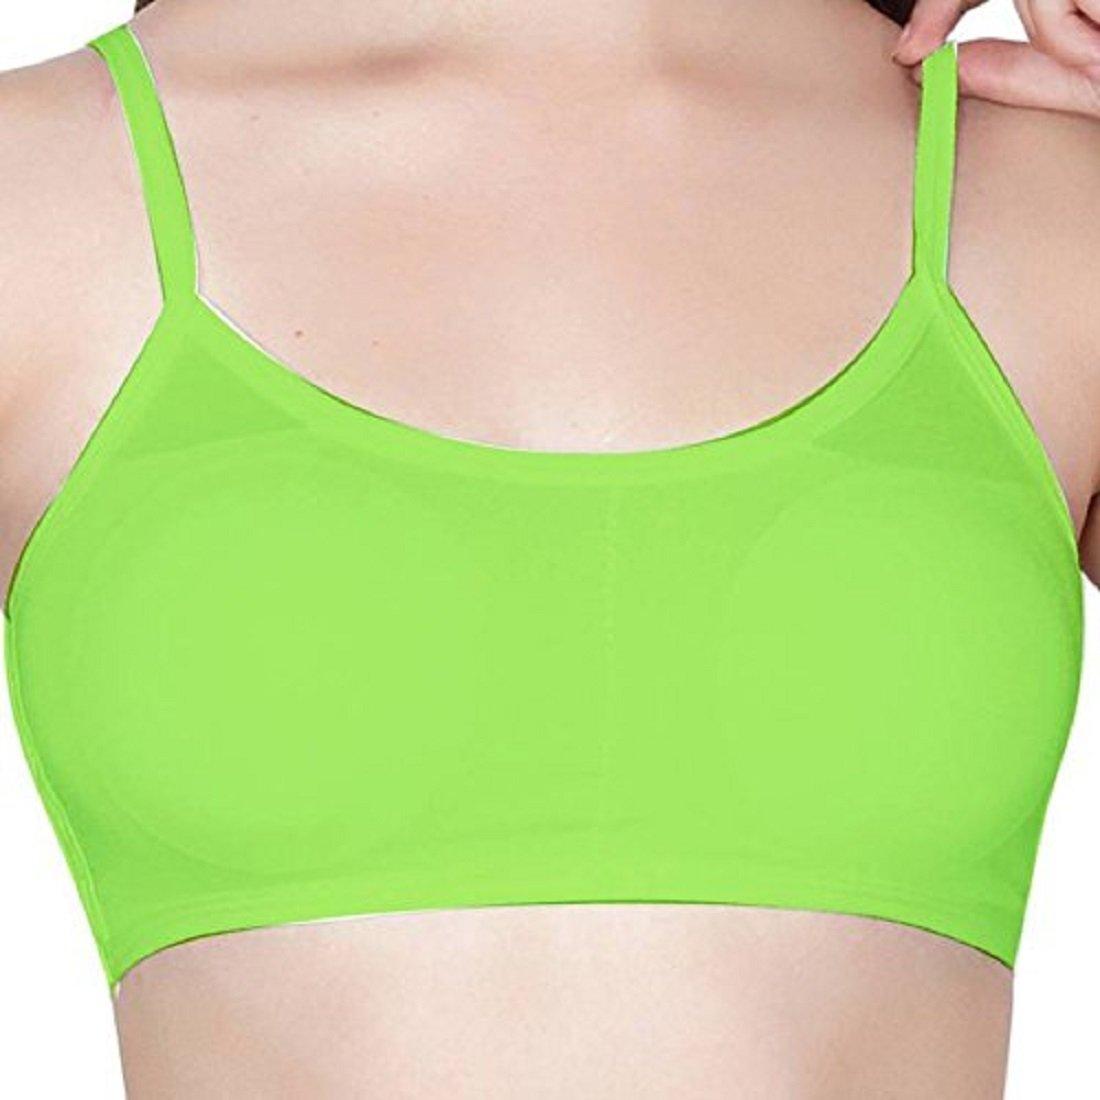 64f96dc3e2be8b Shoppy Villa Women s Cotton 6 Straps Padded Bralette Bra